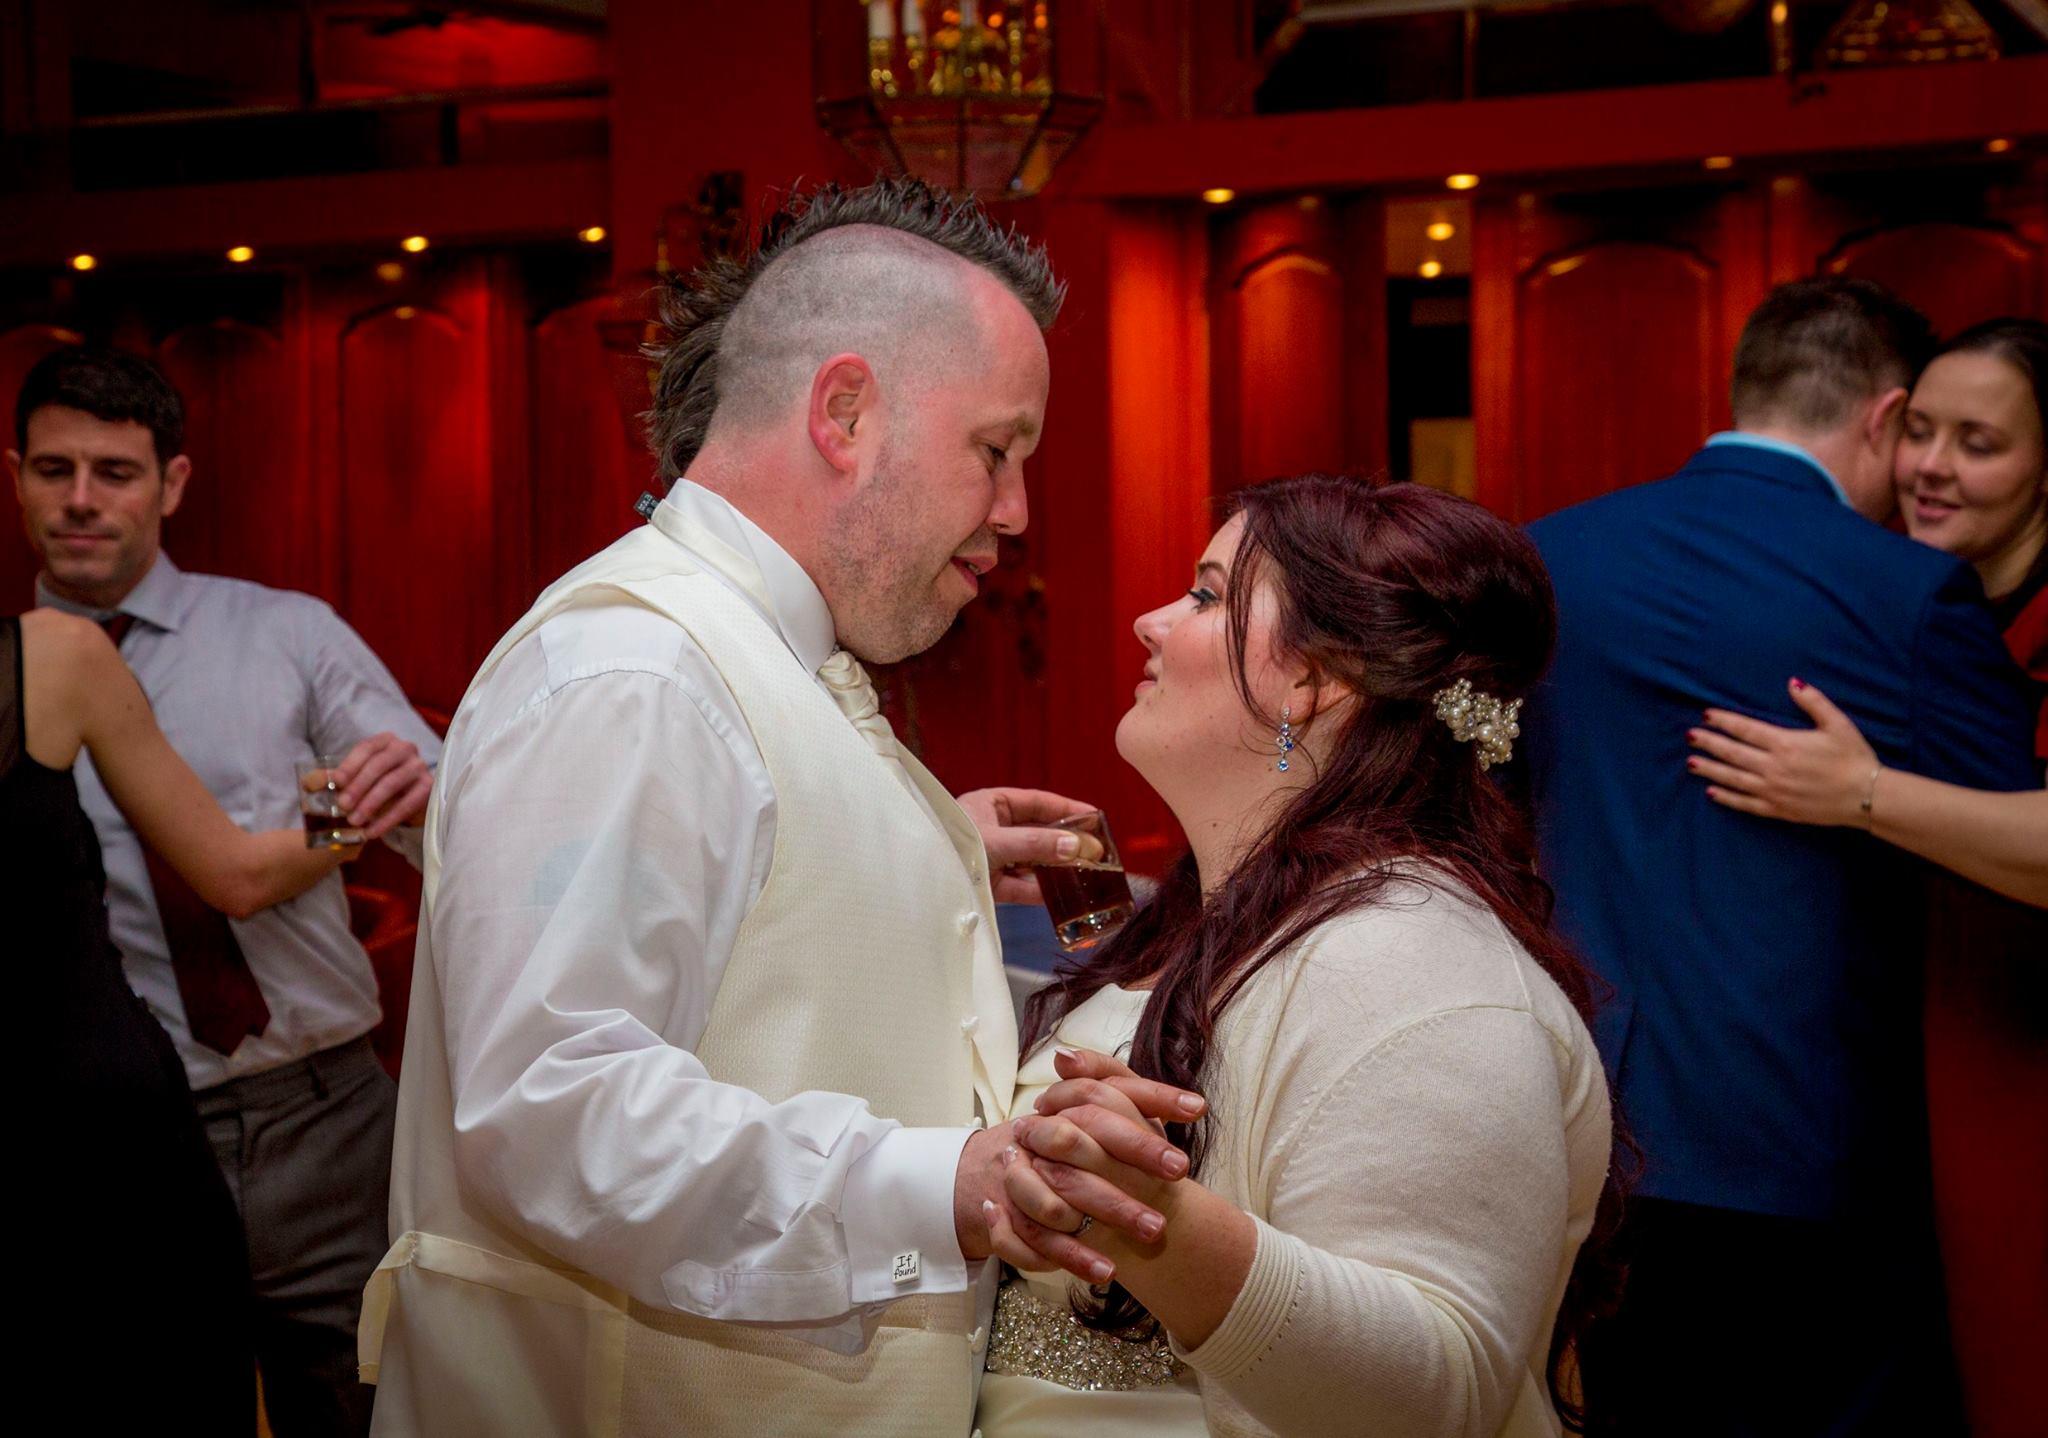 cornwall wedding disco dj photographer 16